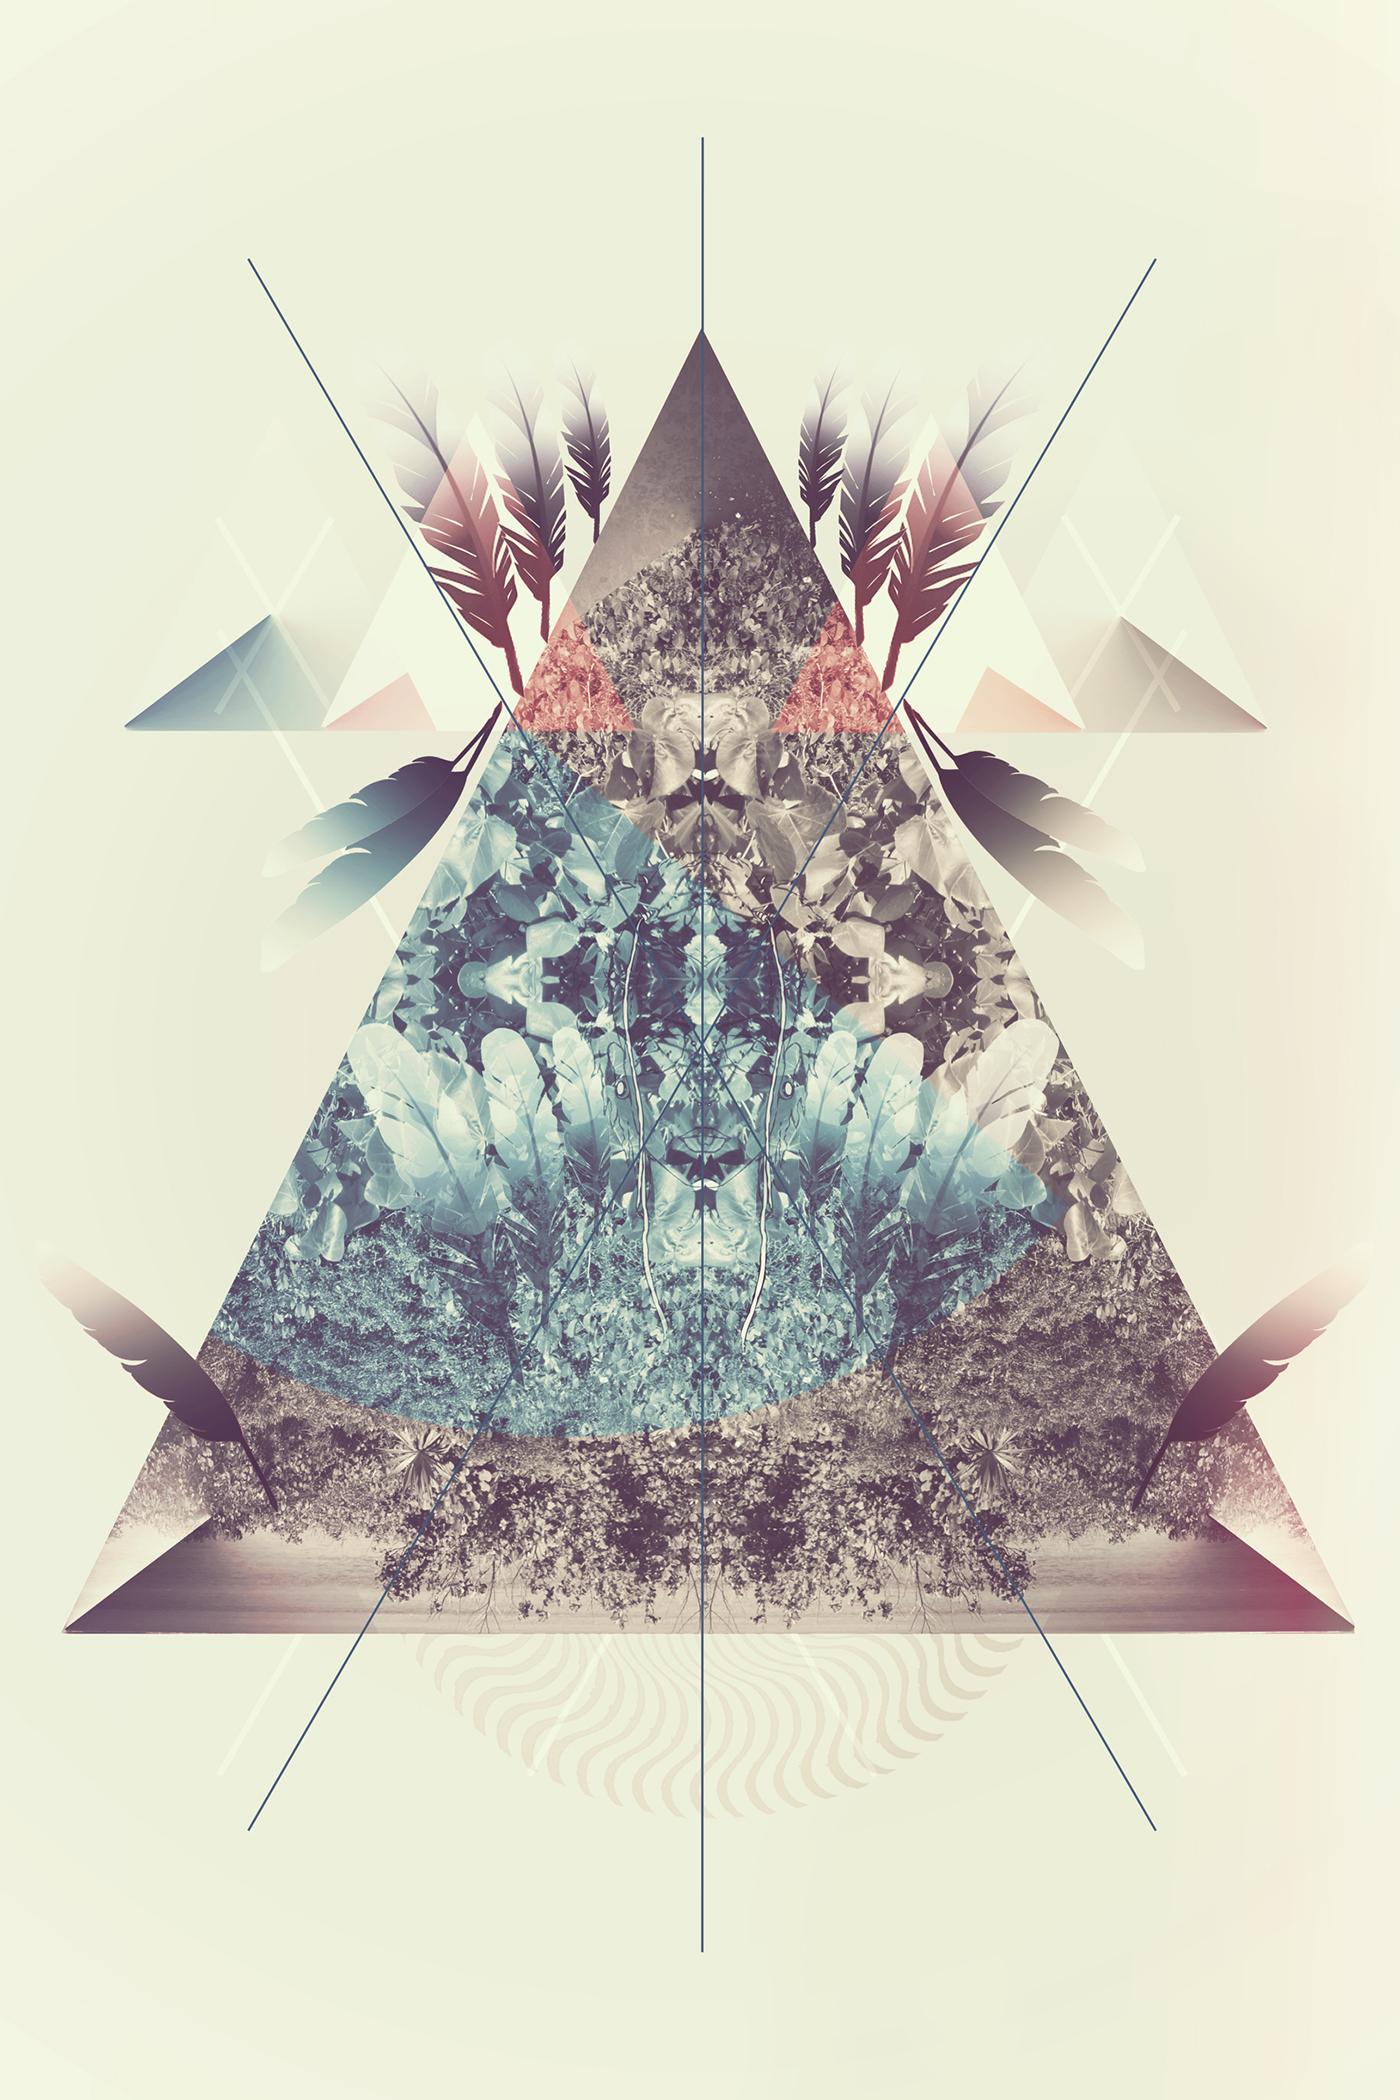 Wallpaper Geometric Hd Altern Natives On Behance